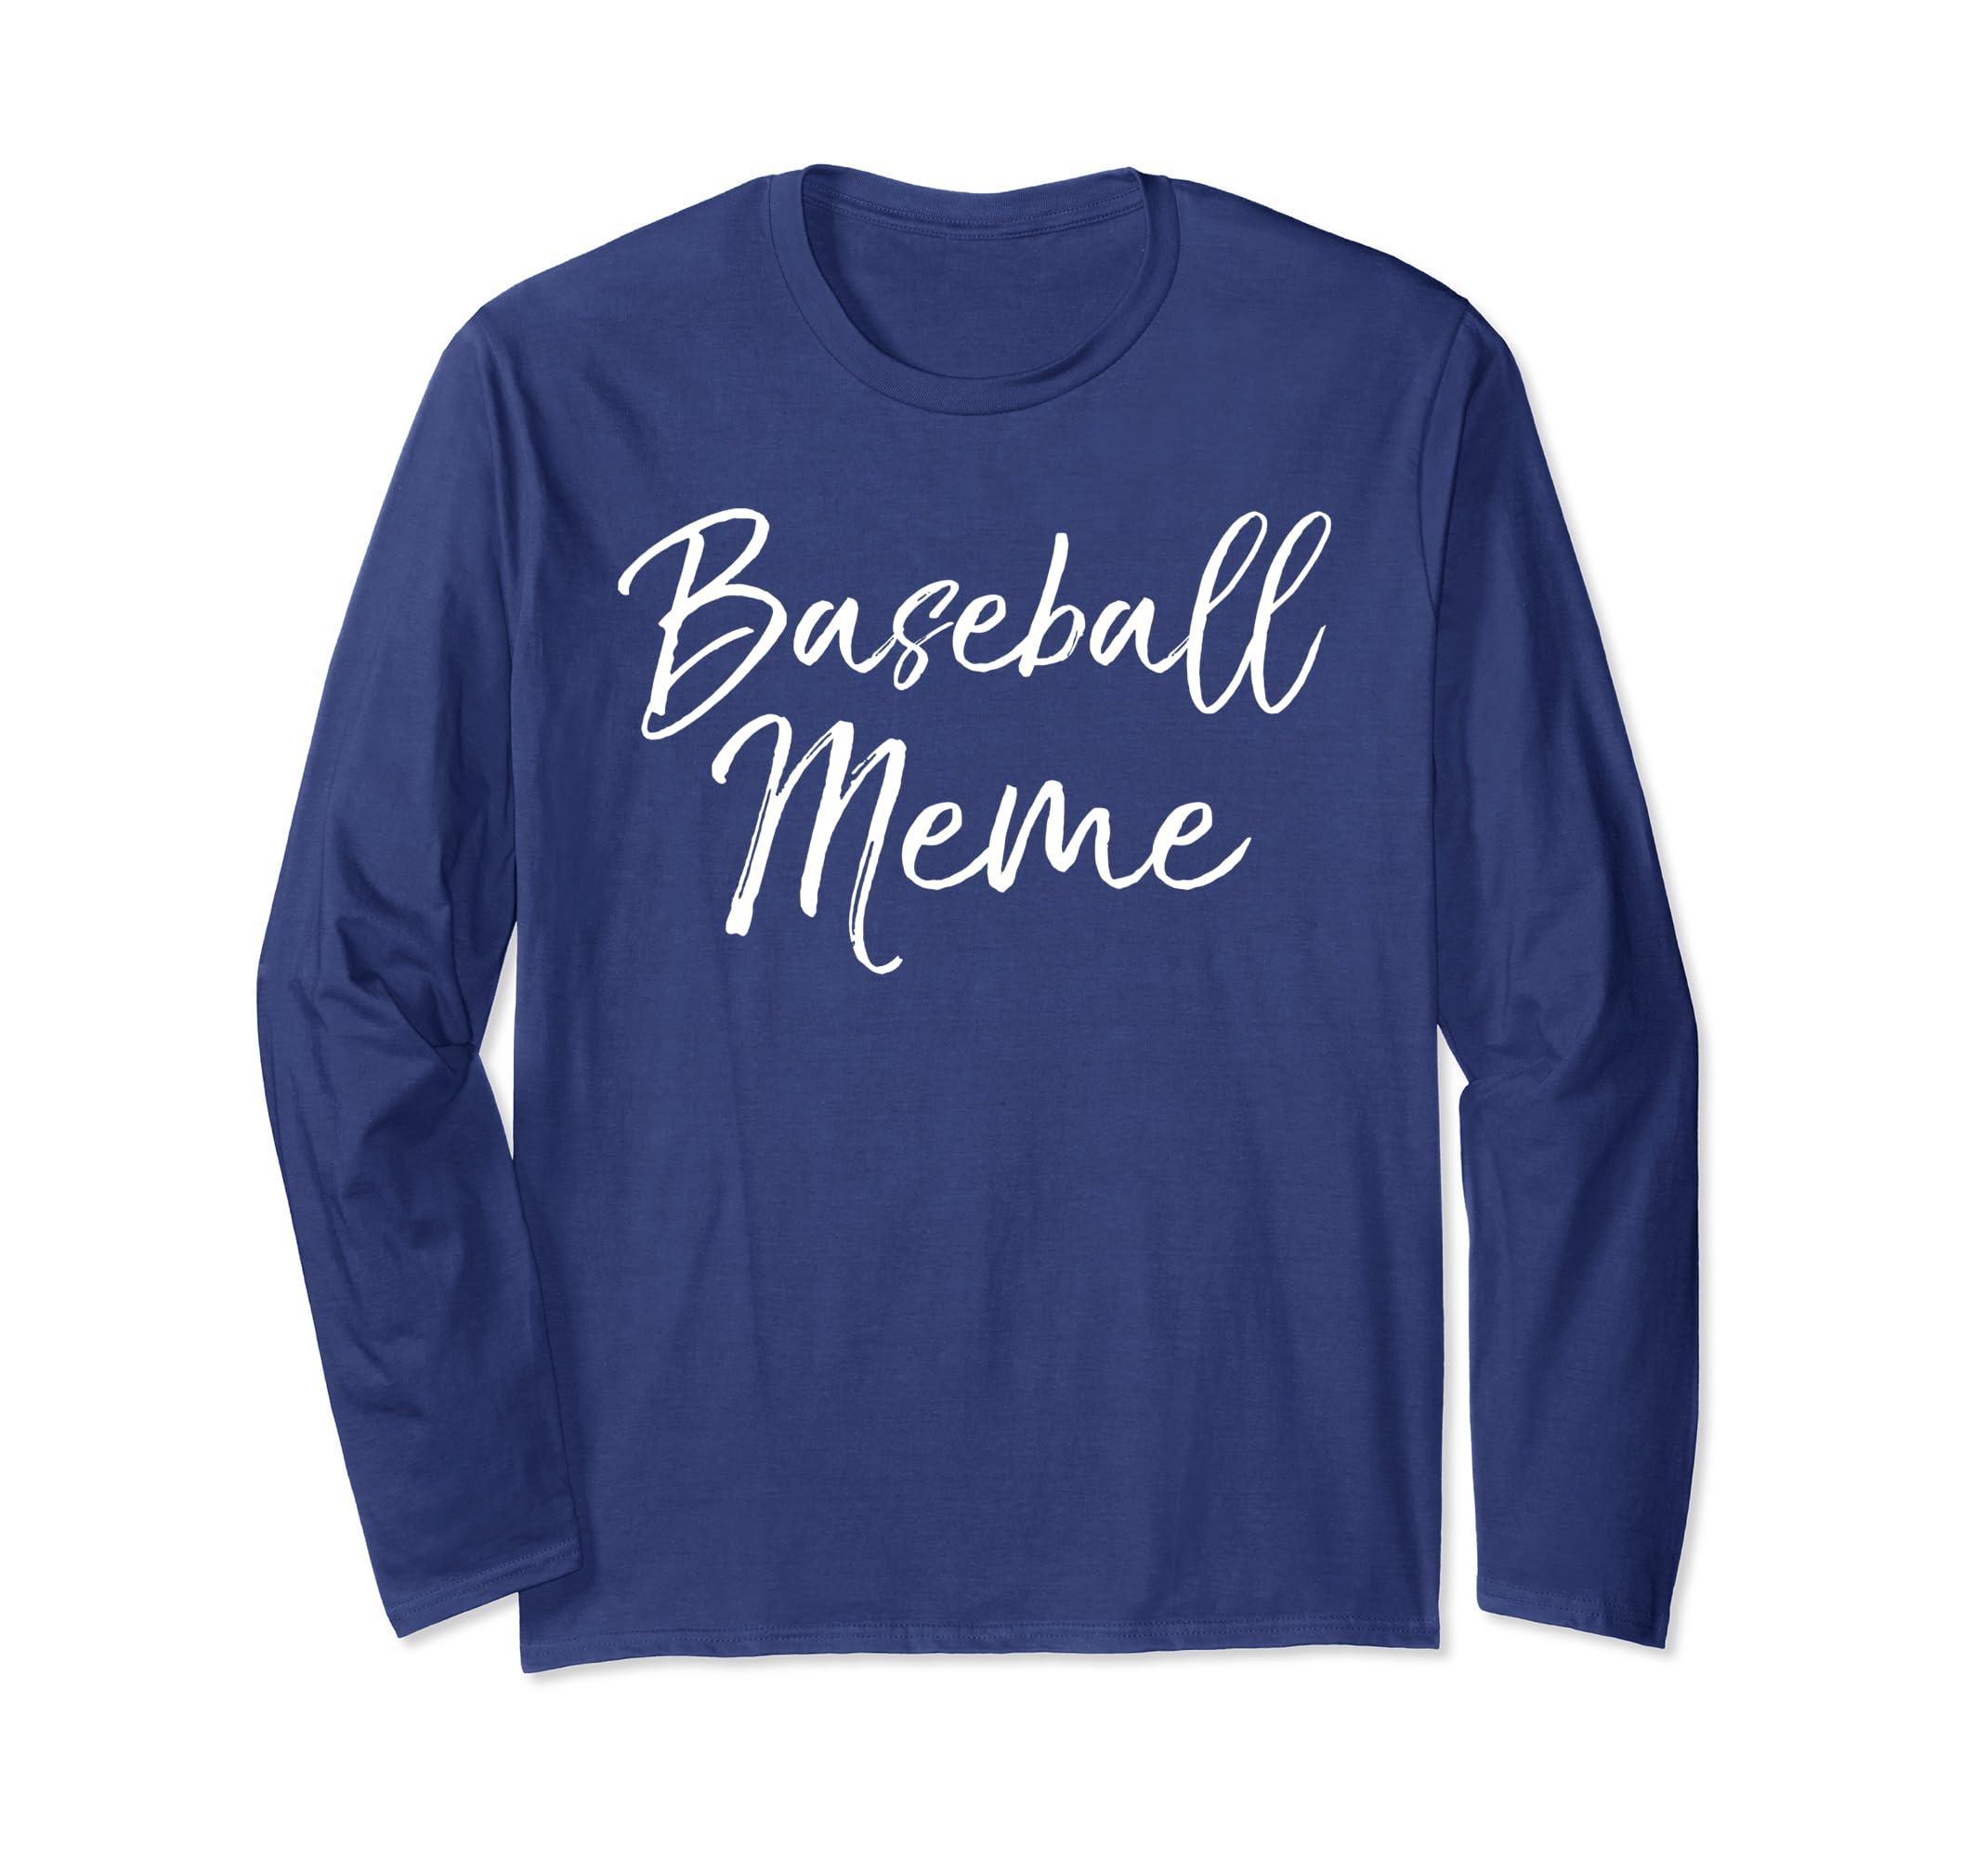 195ce616 Amazon.com: Cute Baseball Gift for Grandma & Mother's Day Baseball Meme  Long Sleeve T-Shirt: Clothing